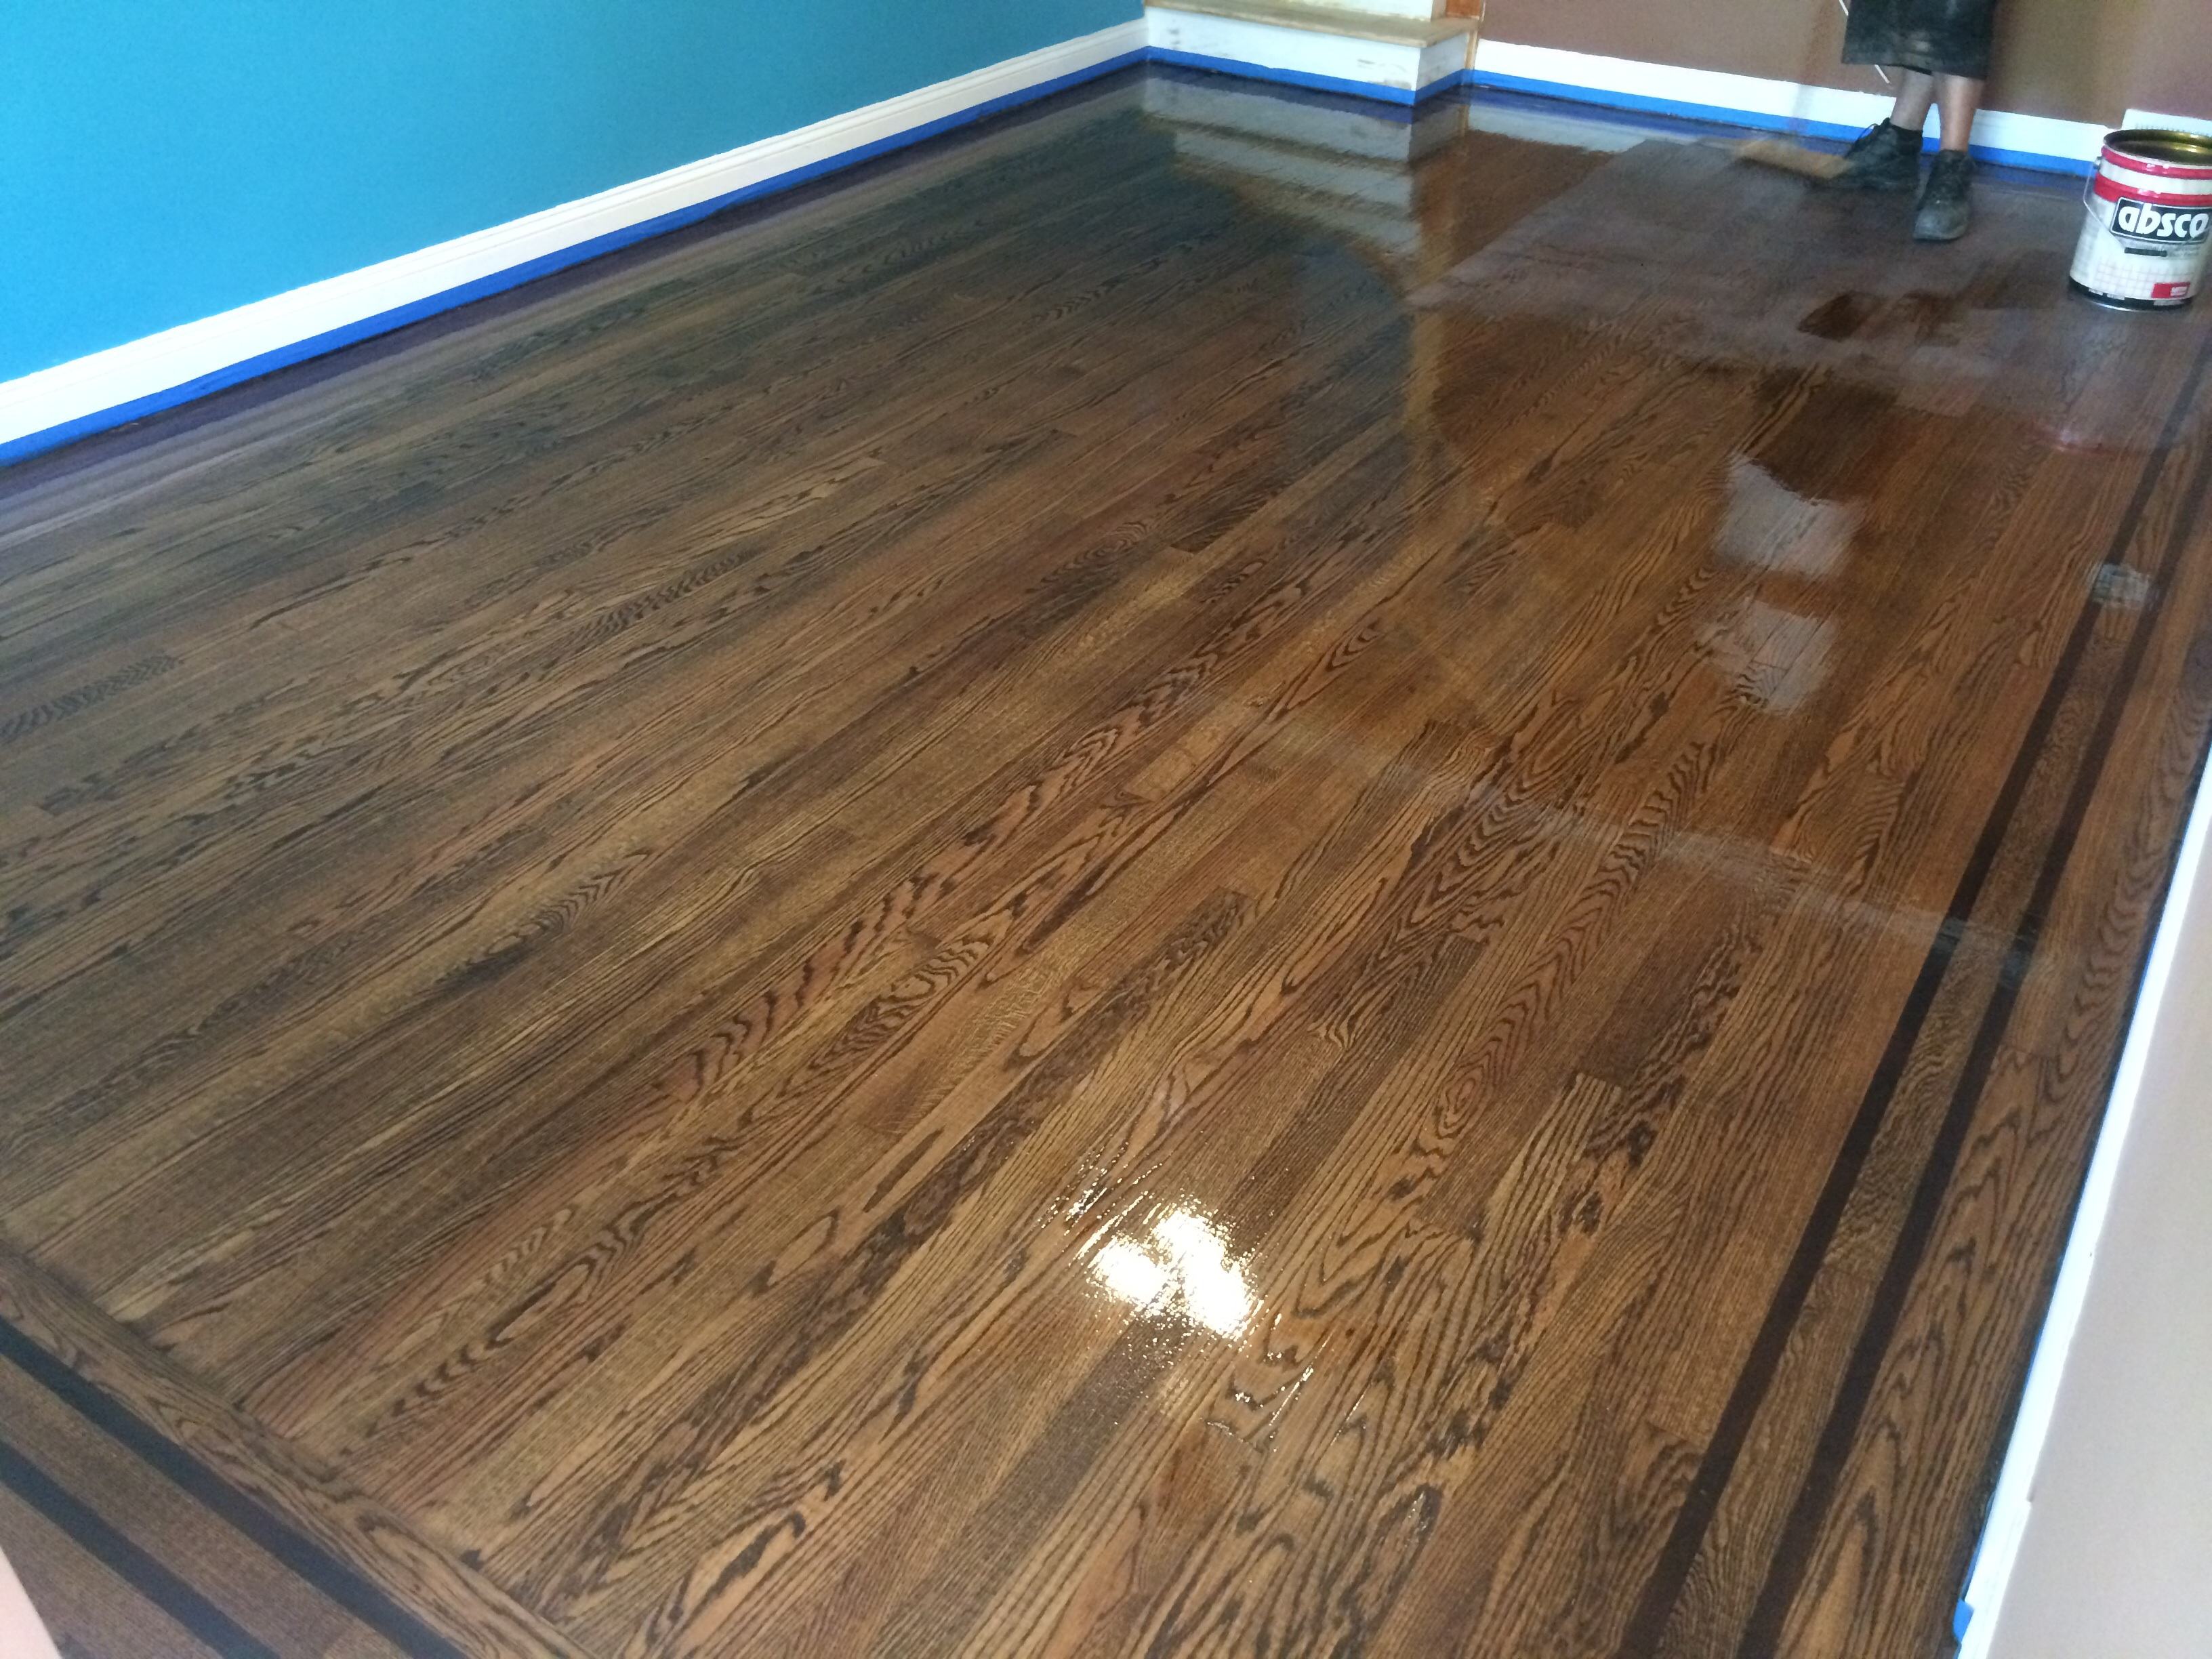 Franks floors and refinishing